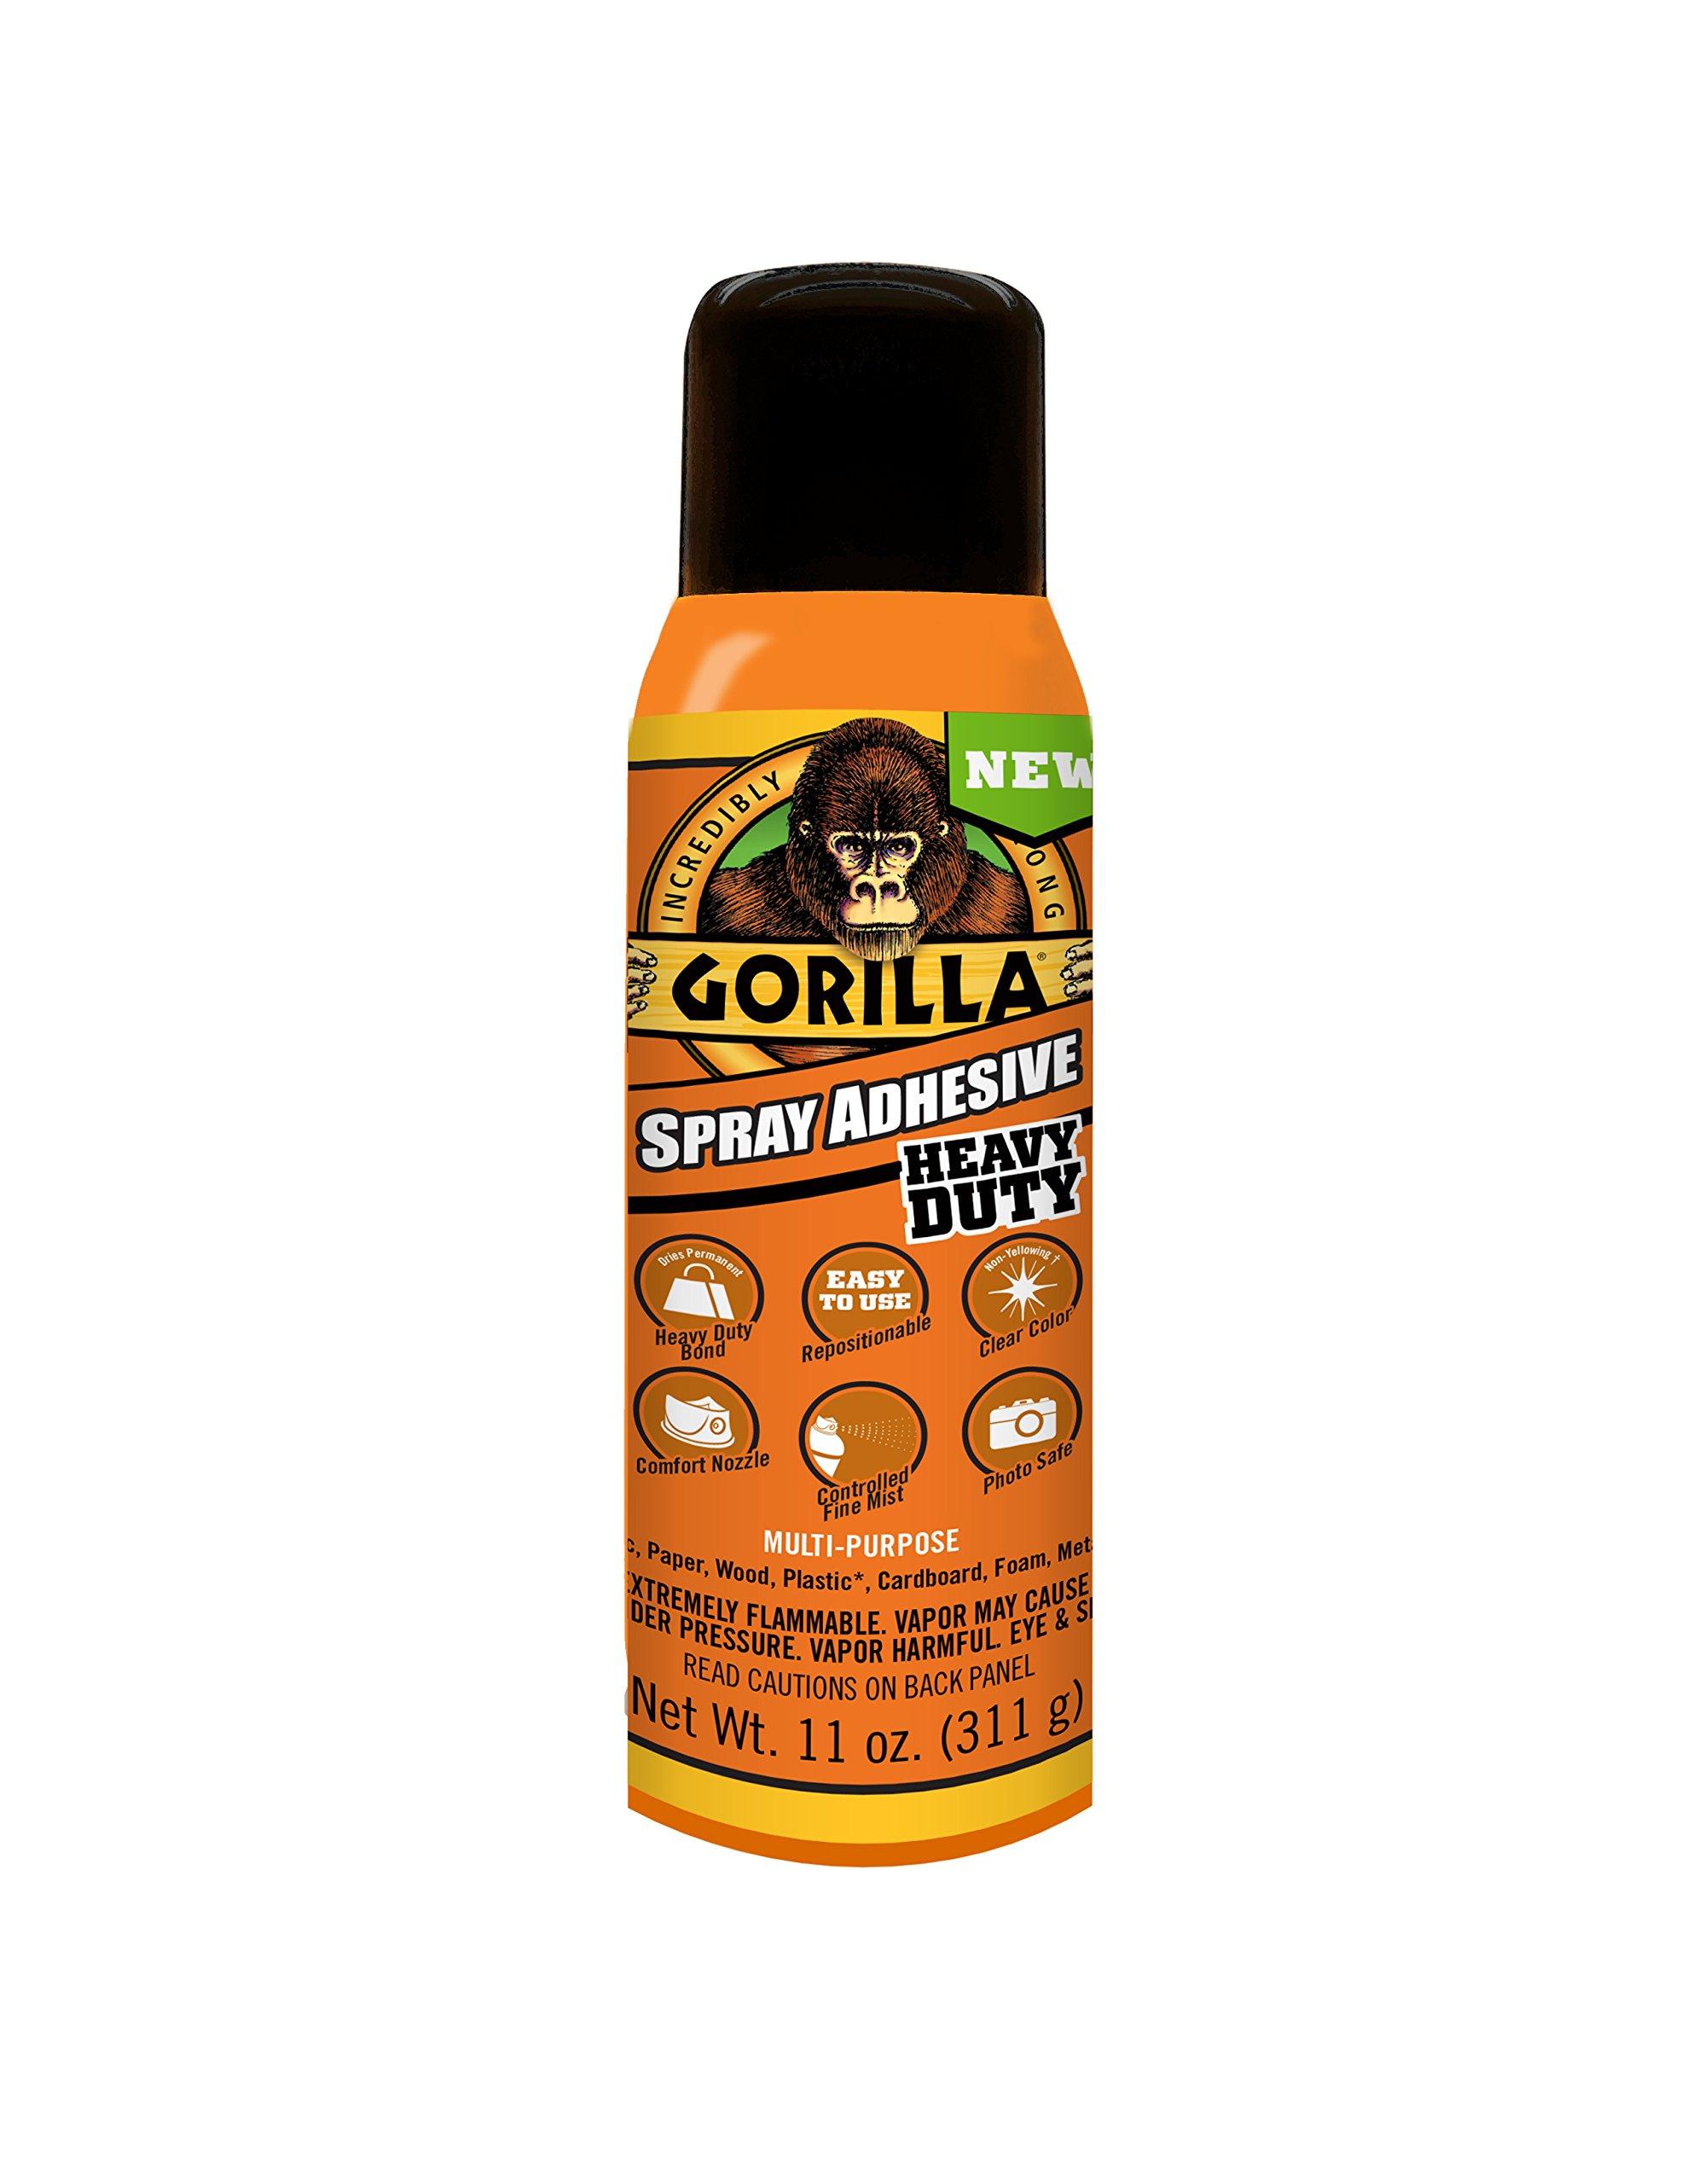 Gorilla 6314407 Spray Adhesive 11oz, Clear